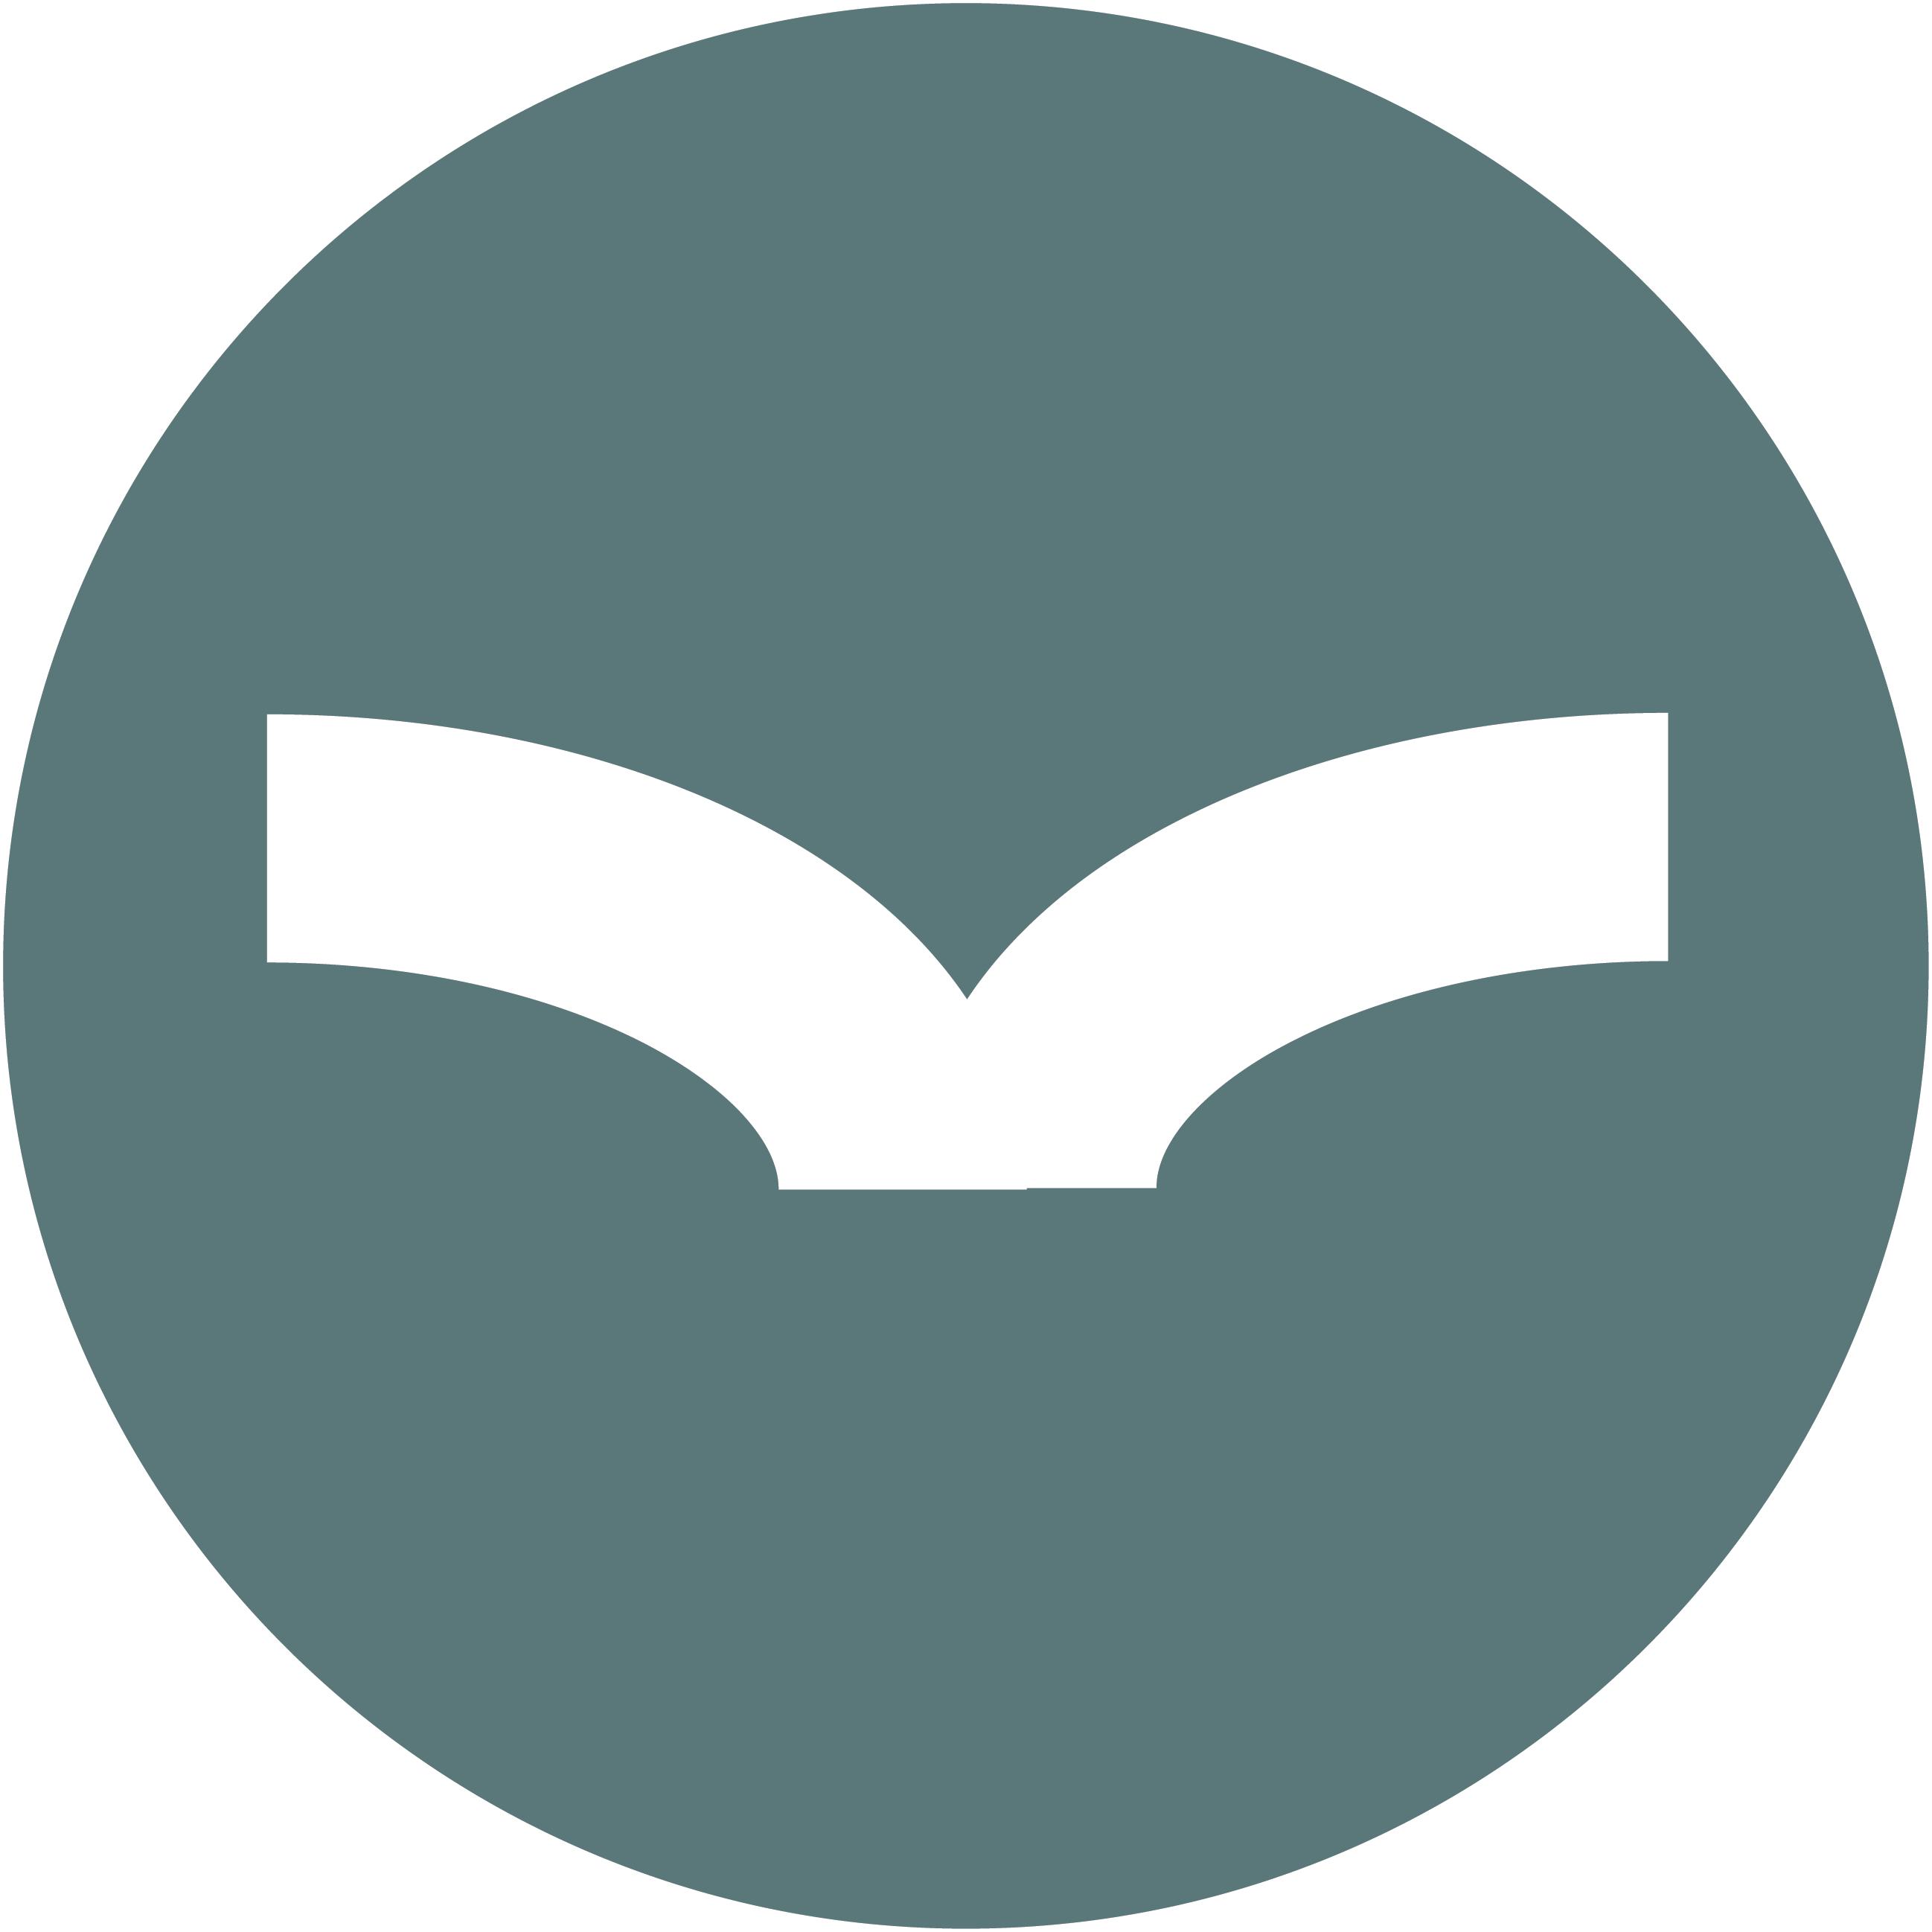 Study Symbol